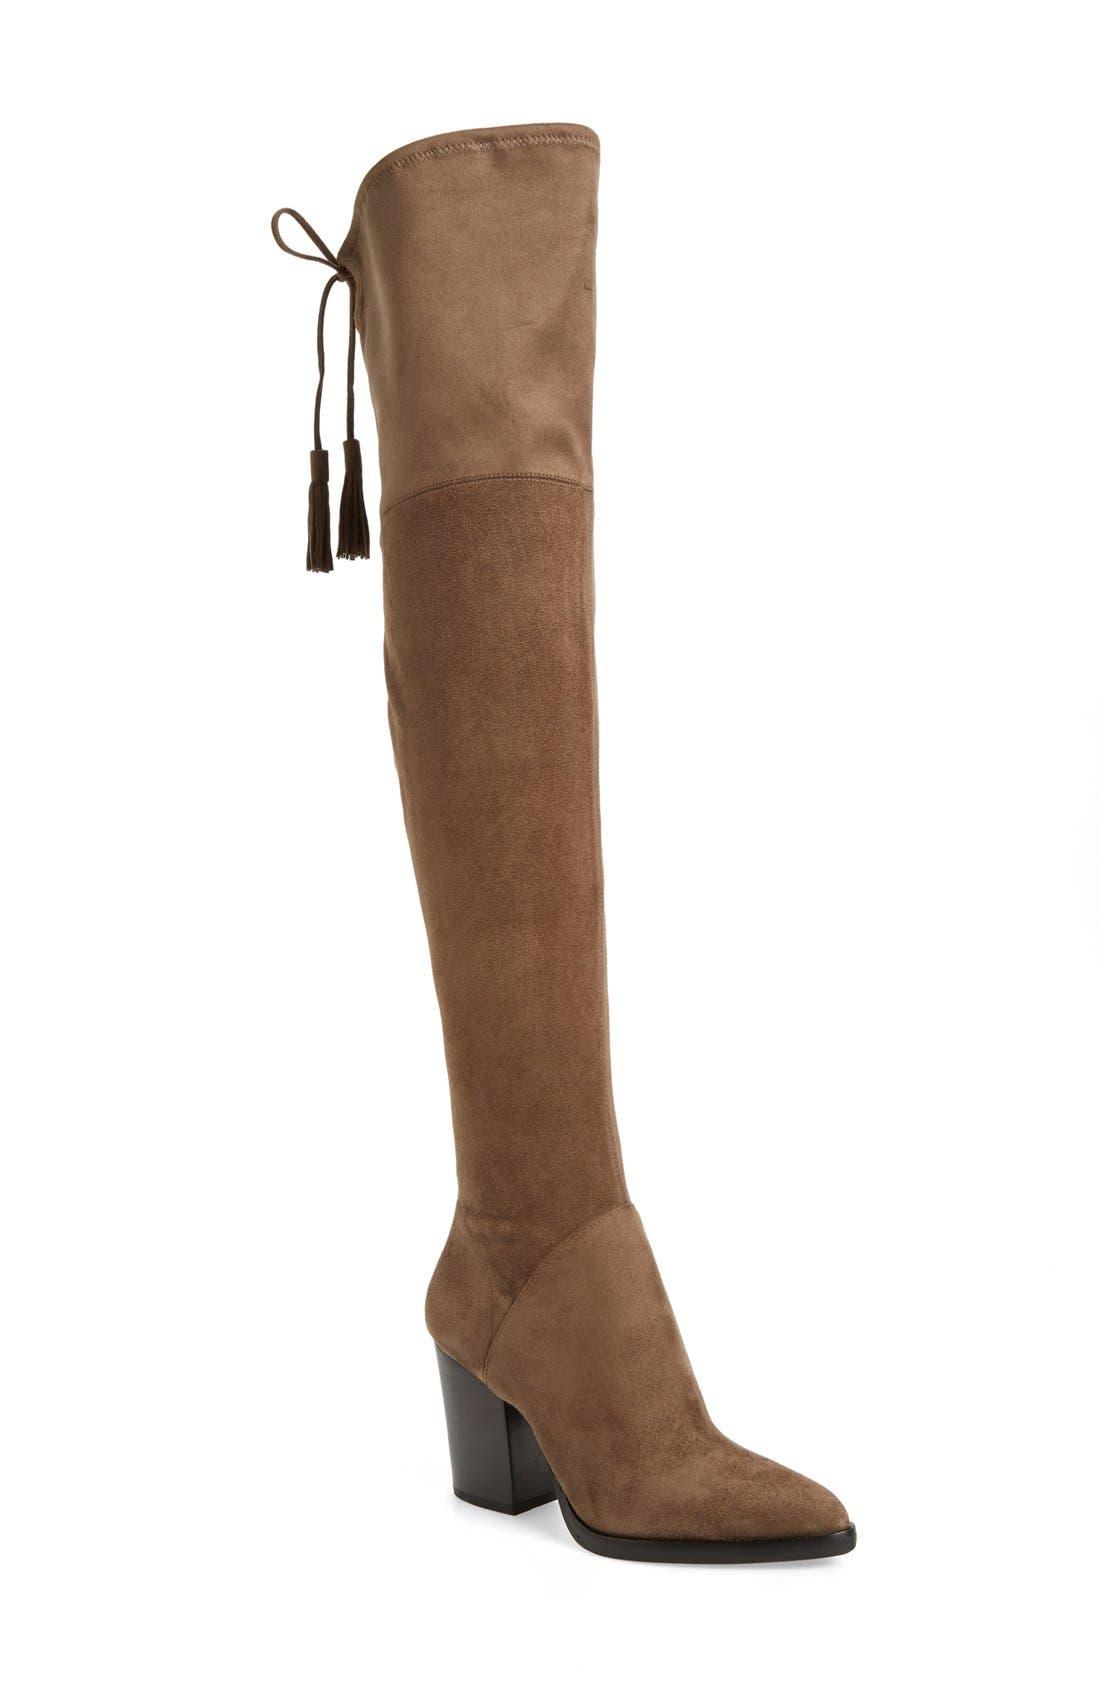 Main Image - Marc Fisher LTD 'Alinda' Over the Knee Boot (Women)